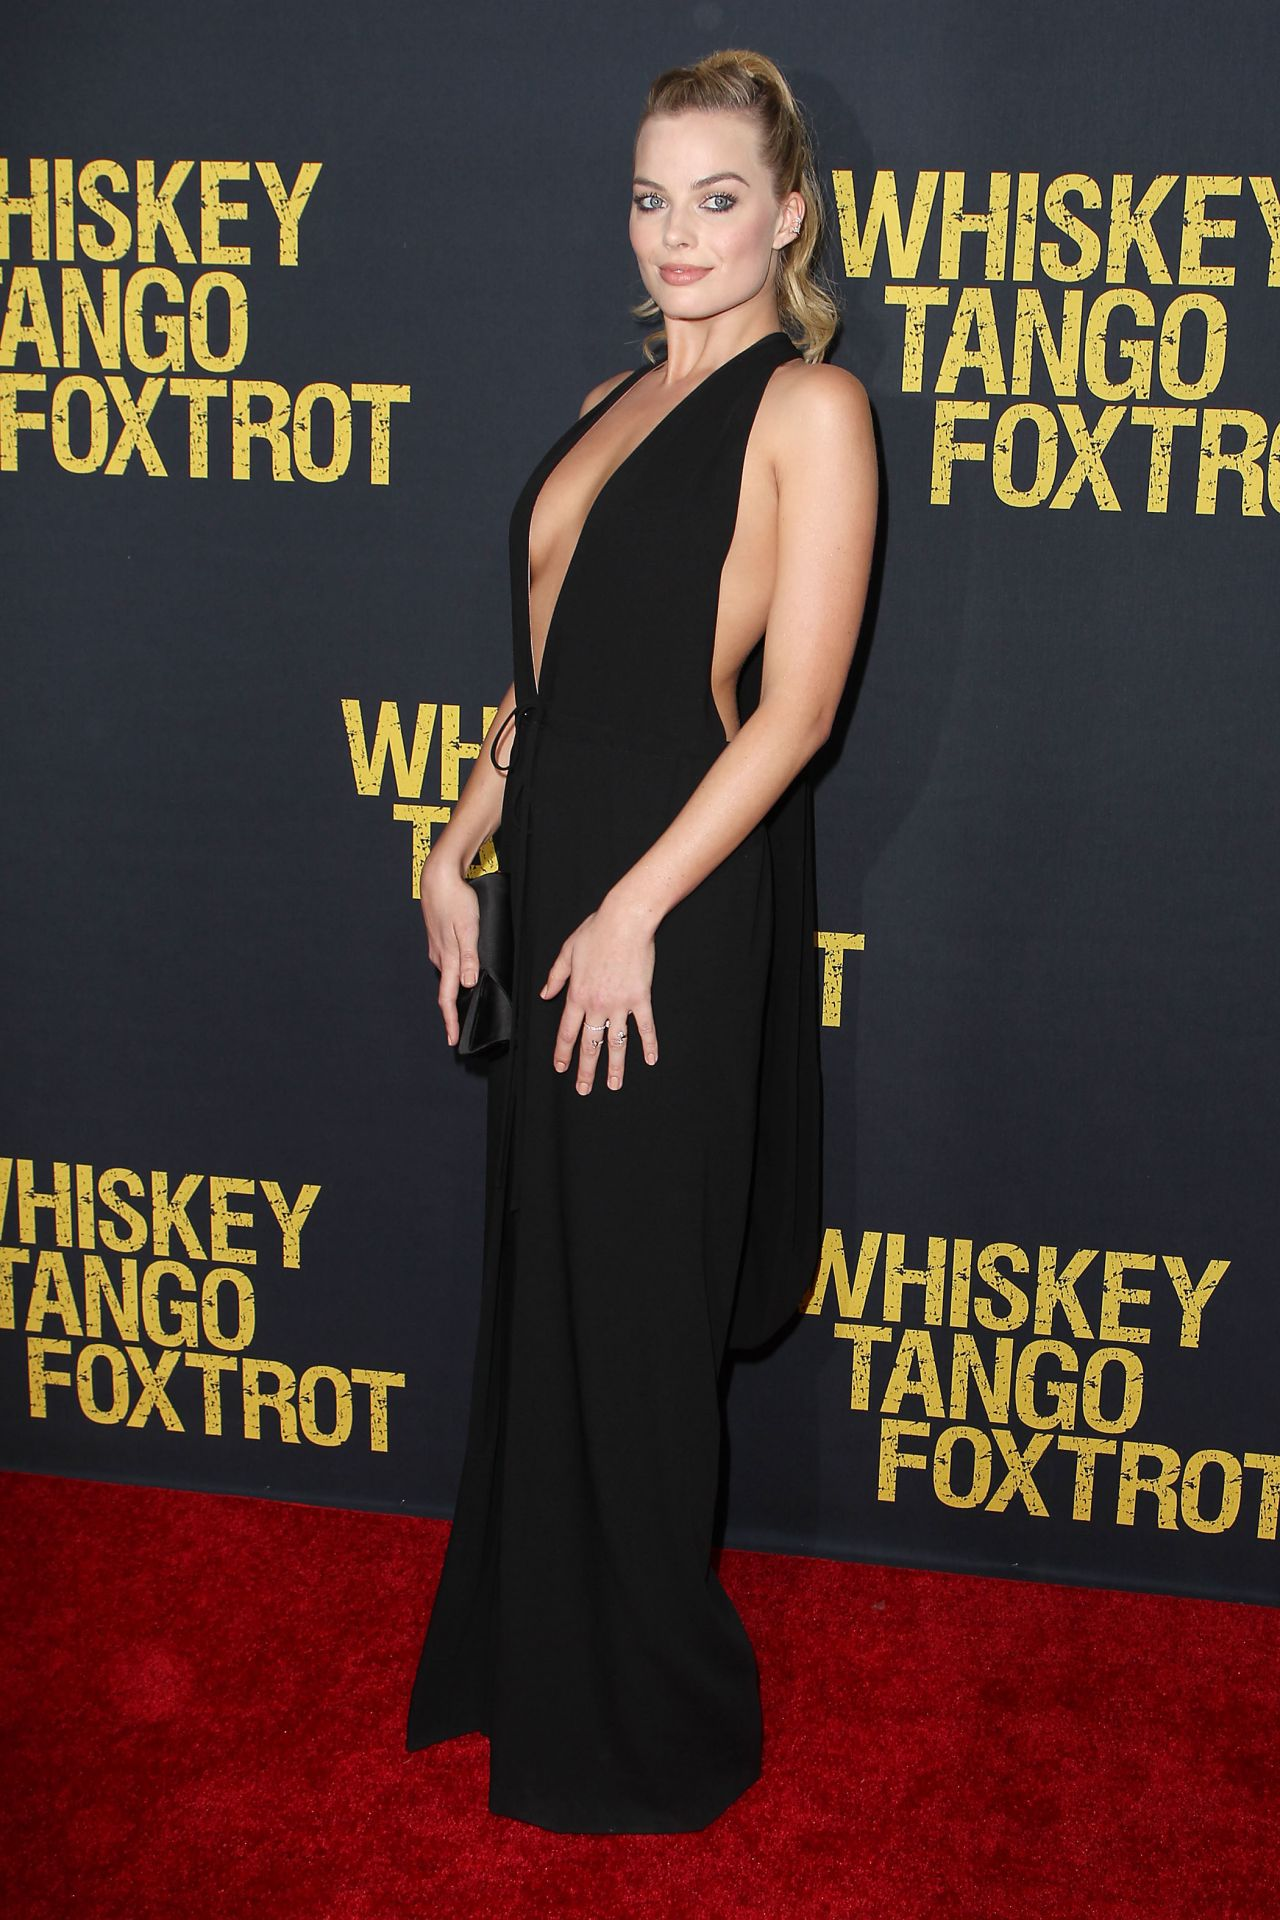 Margot Robbie Whiskey Tango Foxtrot Premiere In New York City Ny